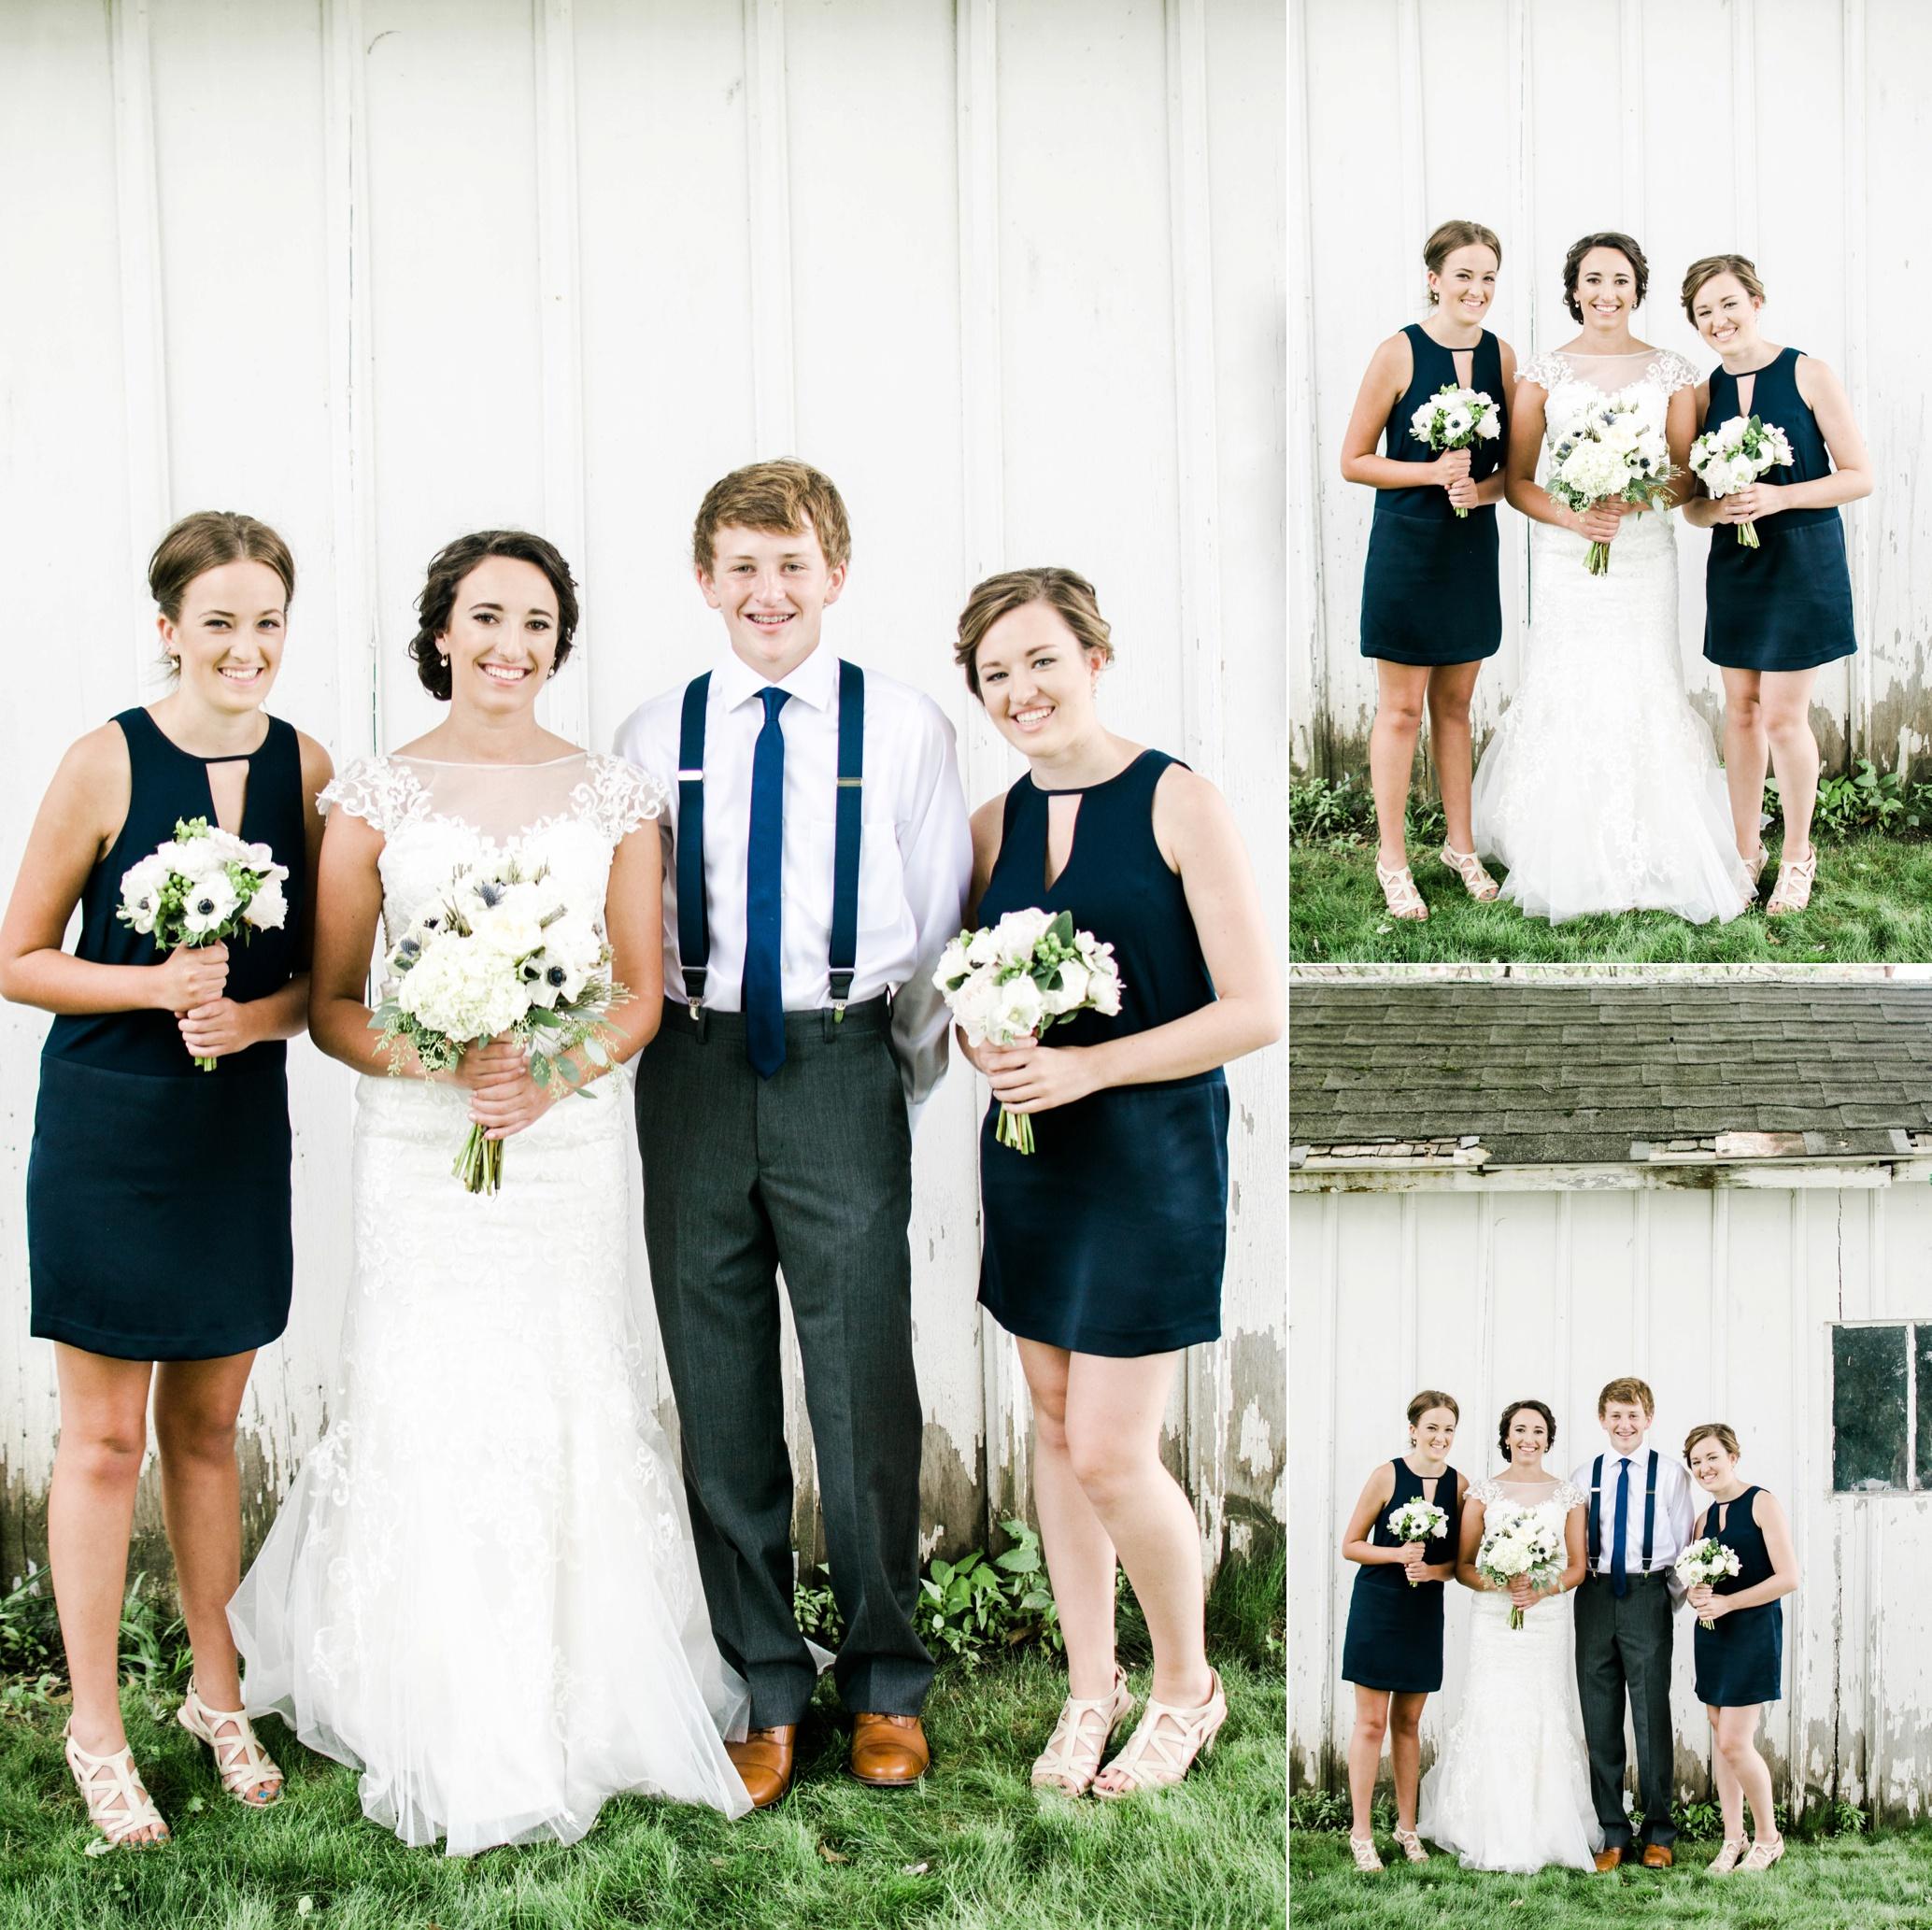 Palmer House and Stable Solon, IA | Ali Leigh Photo Minneapolis Wedding Photographer_0255.jpg